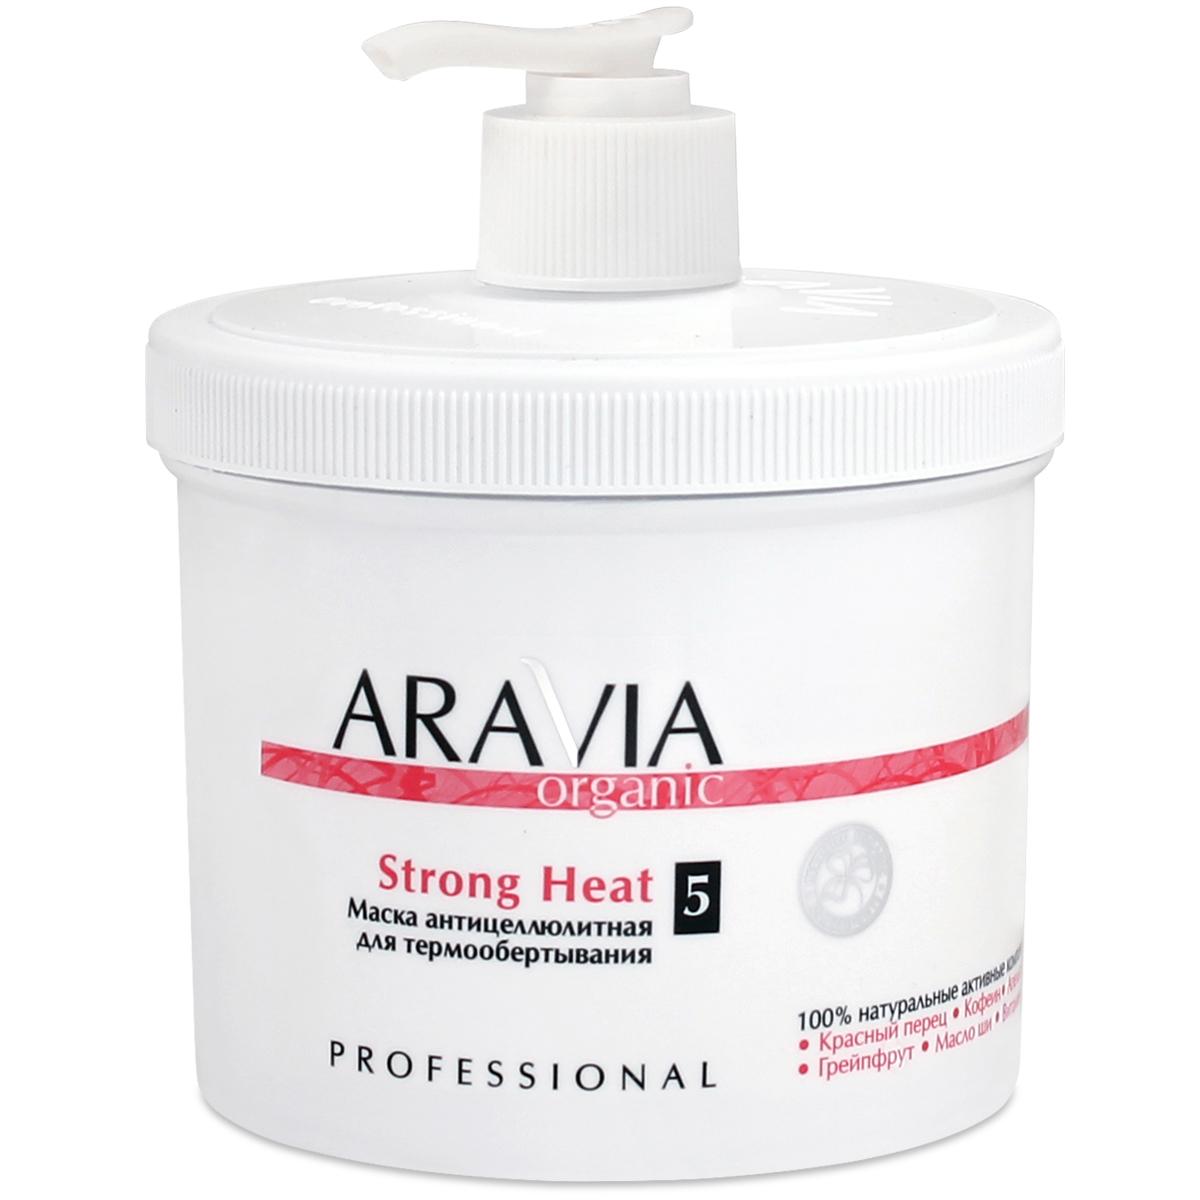 ARAVIA Маска антицеллюлитная для термо обертывания / Strong Heat 550 мл 400g lot top grade 10% caffeine organic guarana extract powder